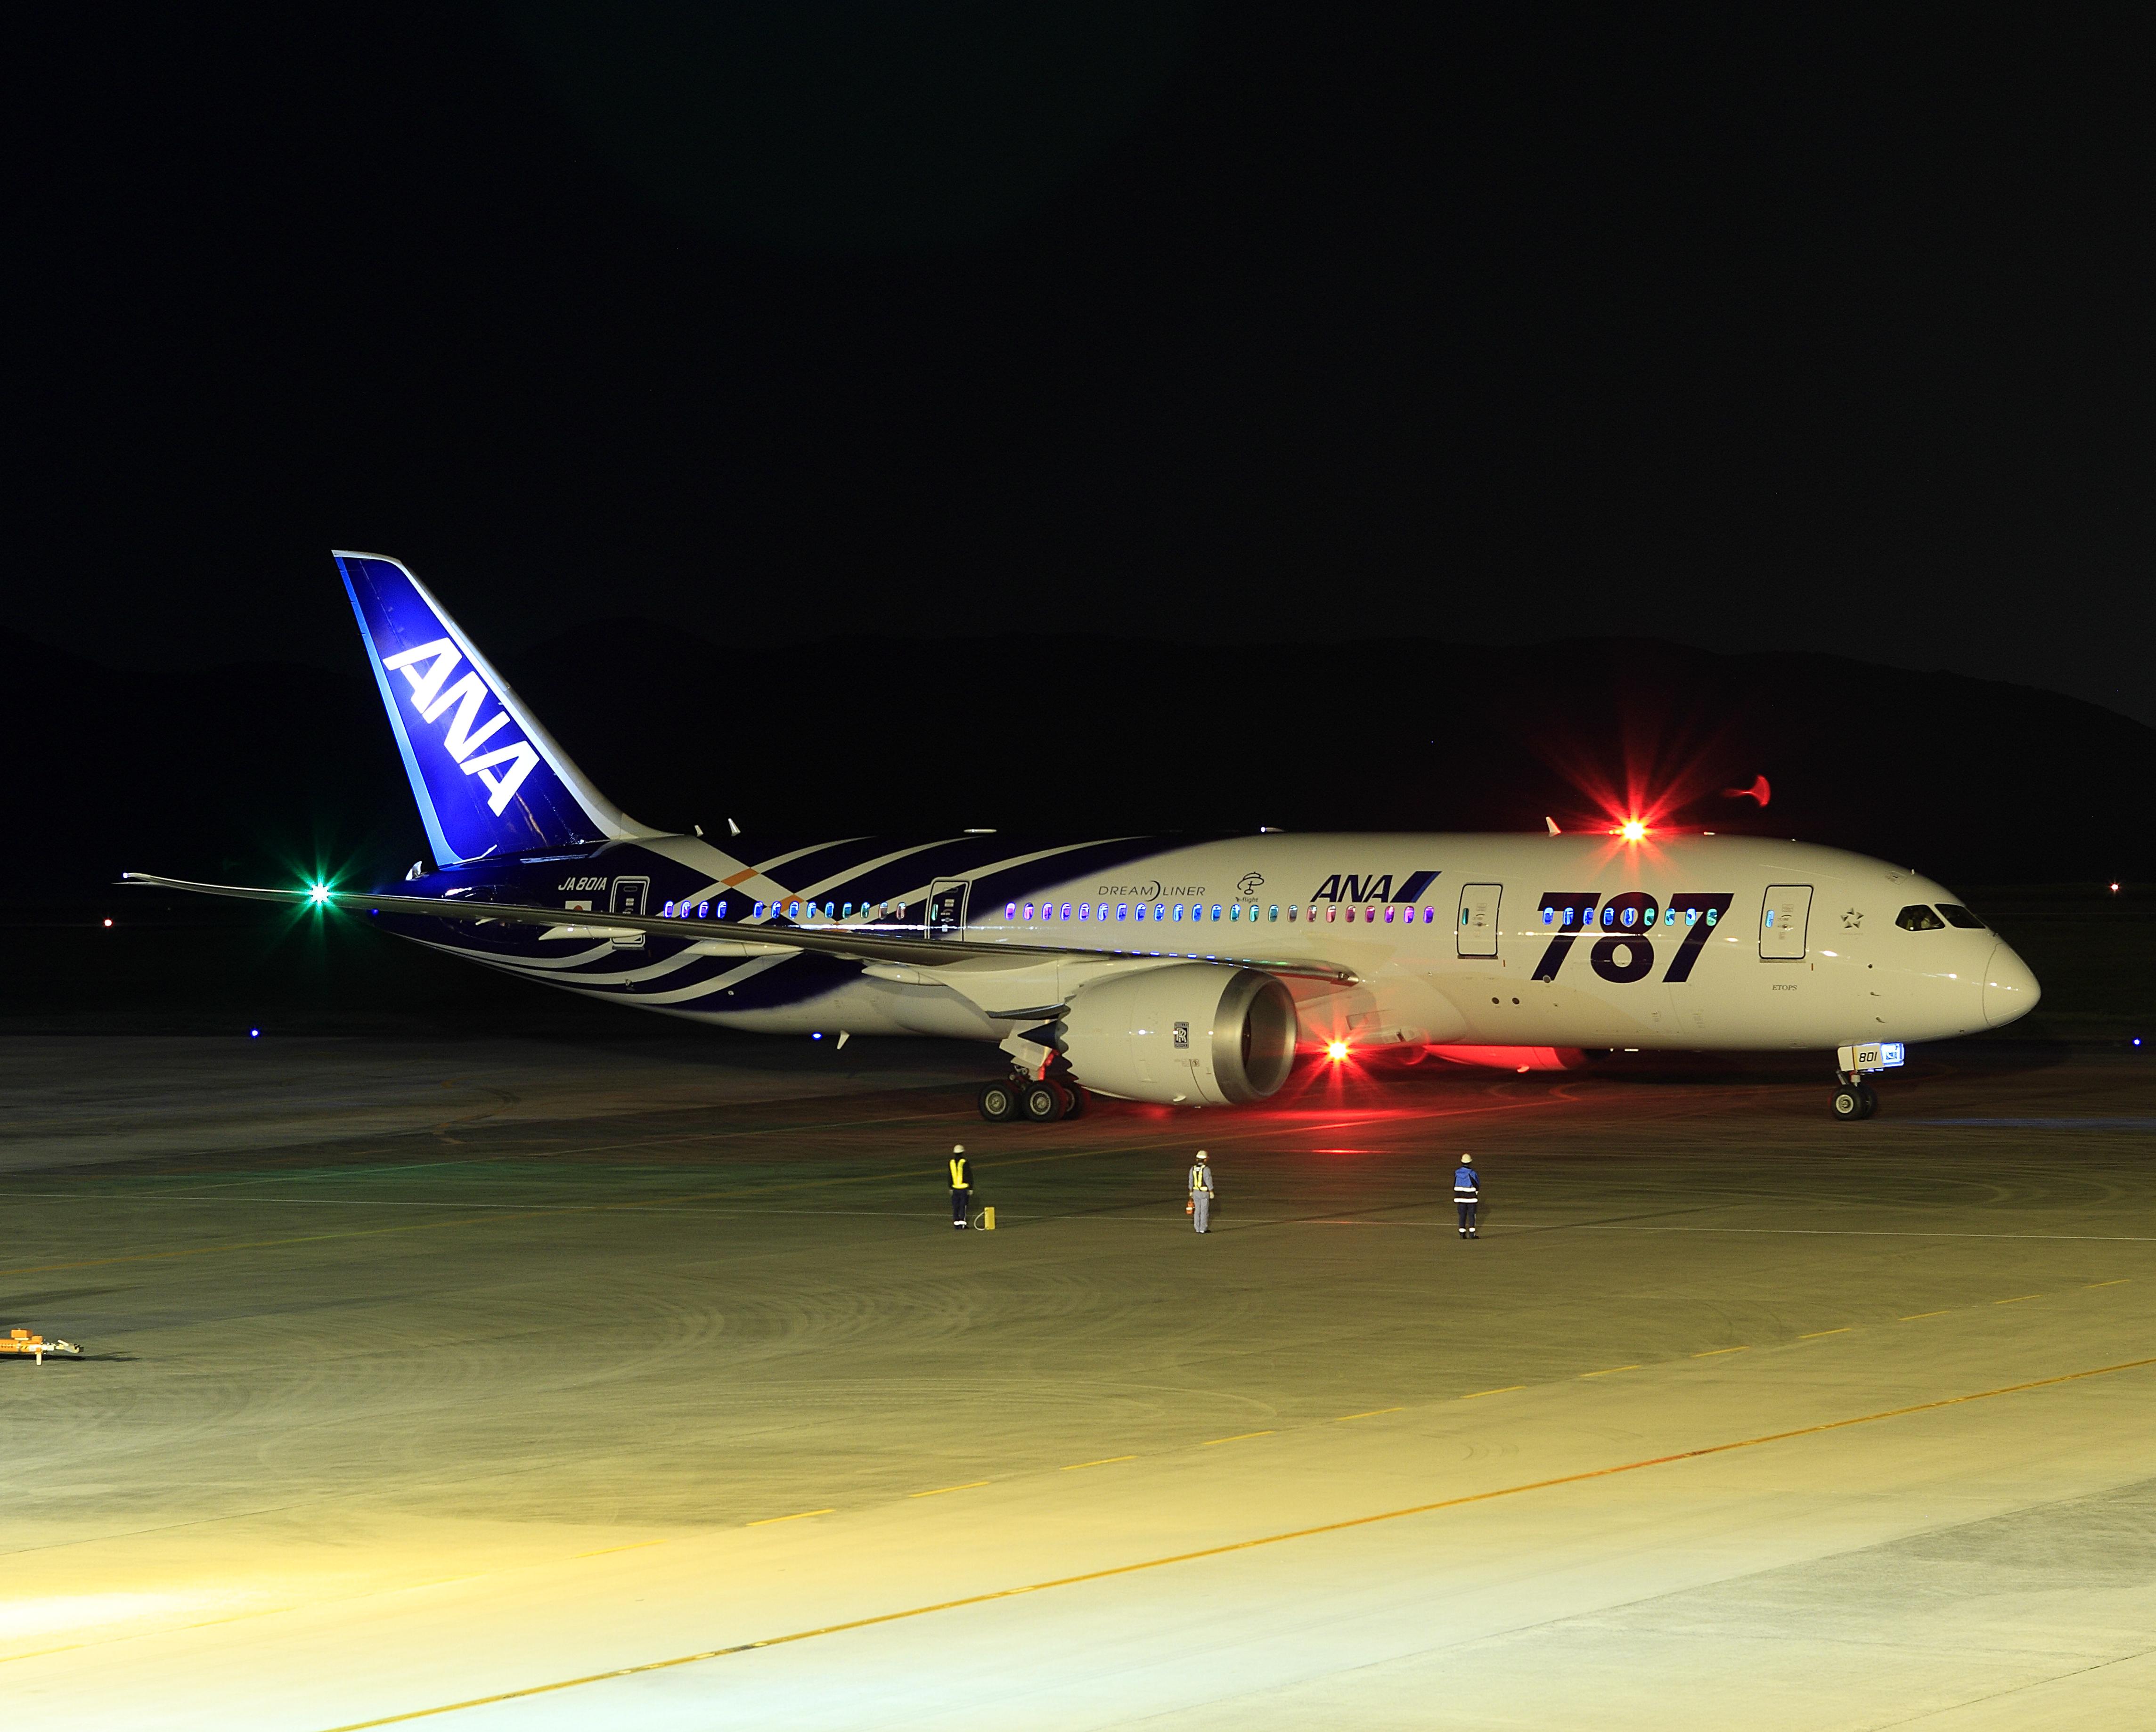 32  Beauty Logo Light for logo light aircraft  111ane